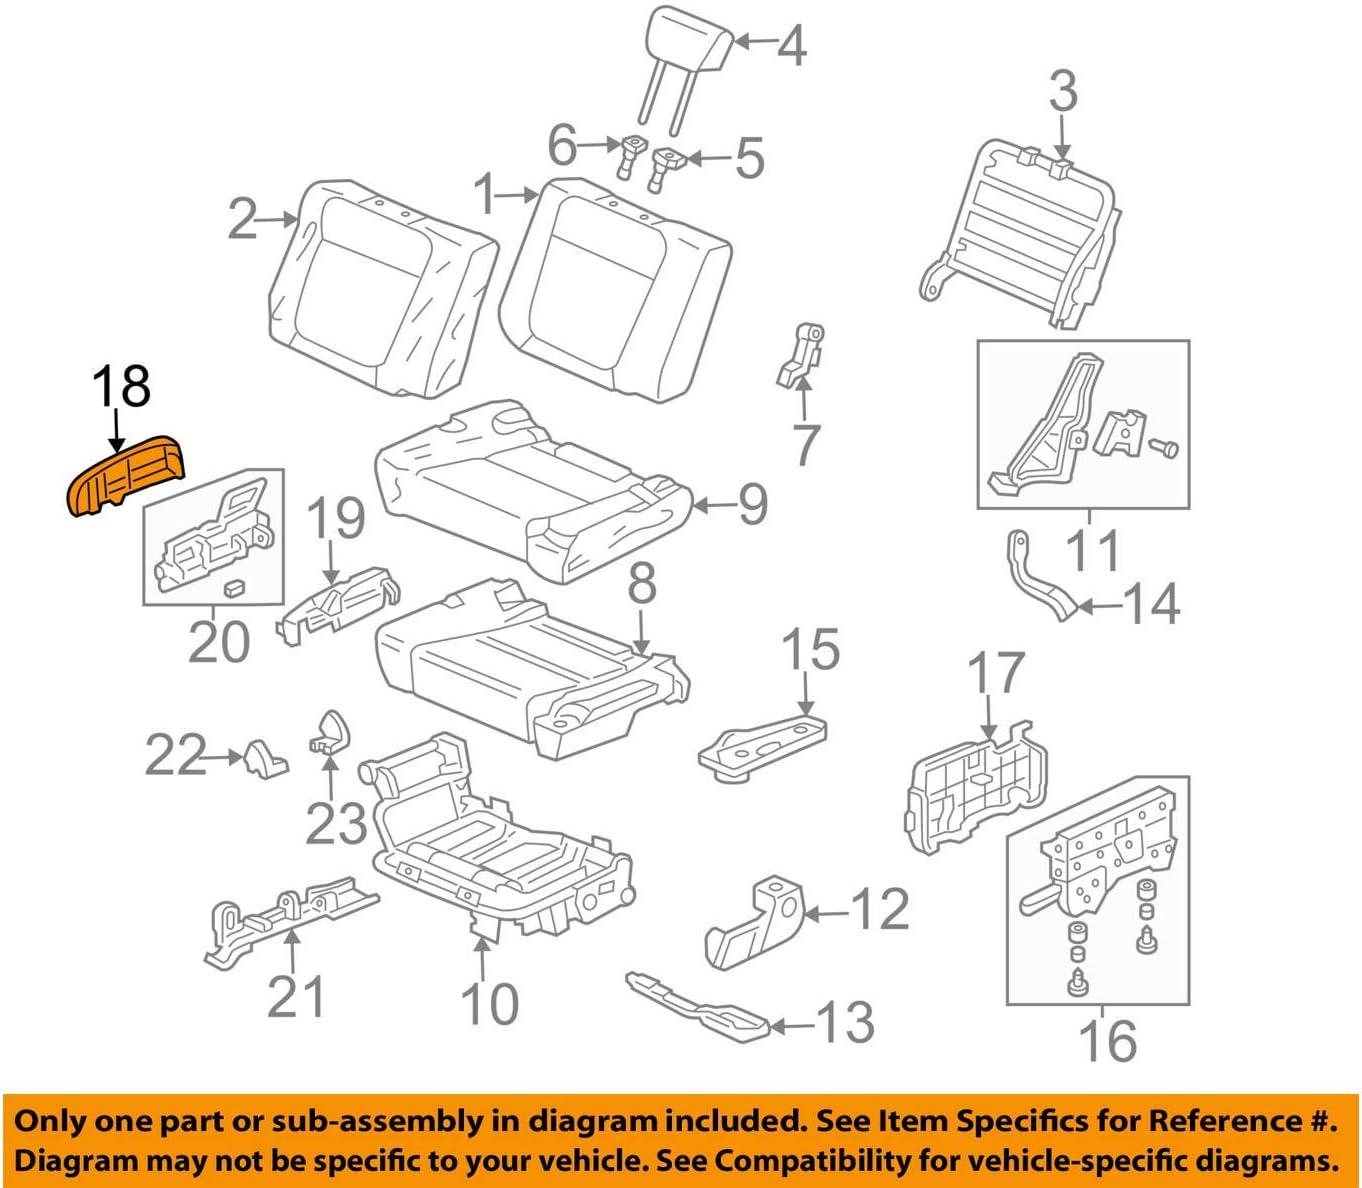 Right Rear Honda Genuine 82151-SV1-L23ZE Seat Back Side Trim Cover